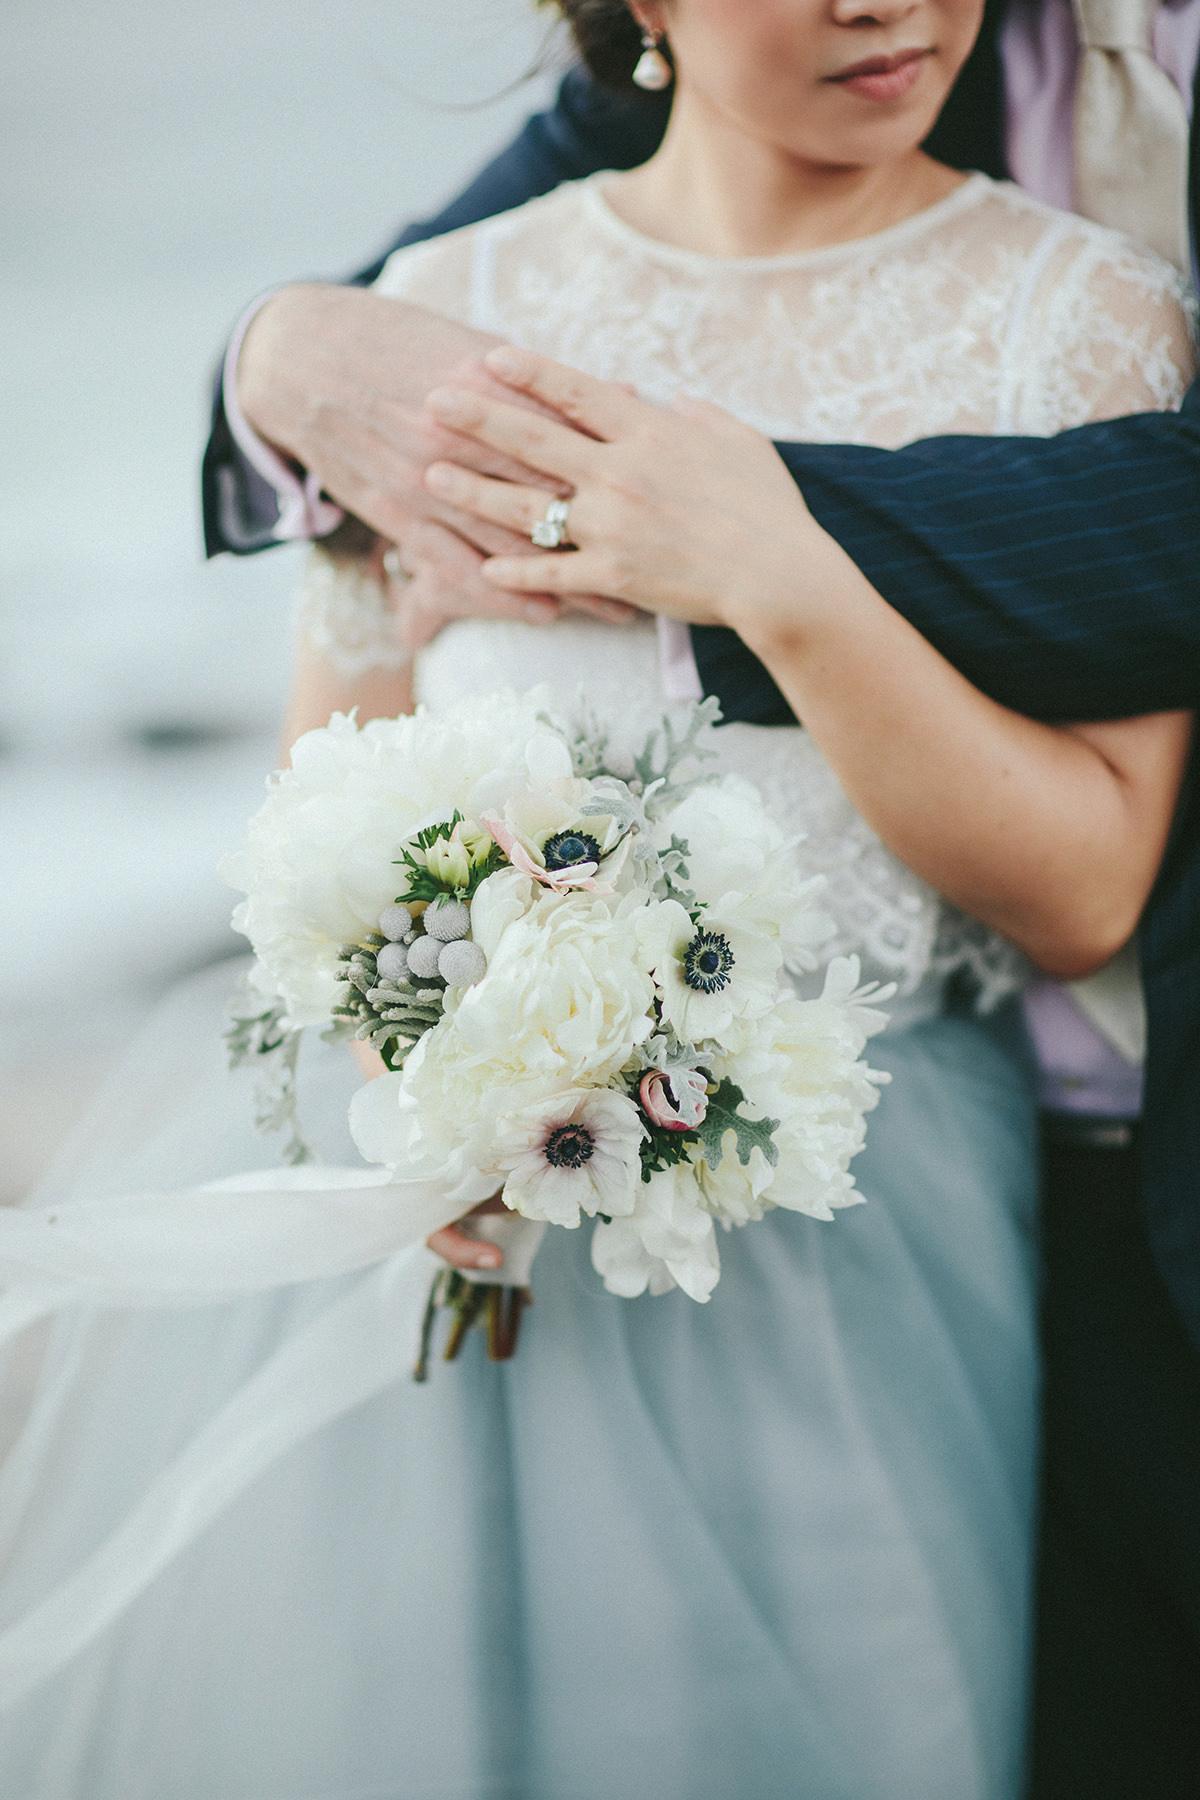 fine art hawaii wedding photography bouquet detail www.melialucida.com #bouquet #blue #ribbons